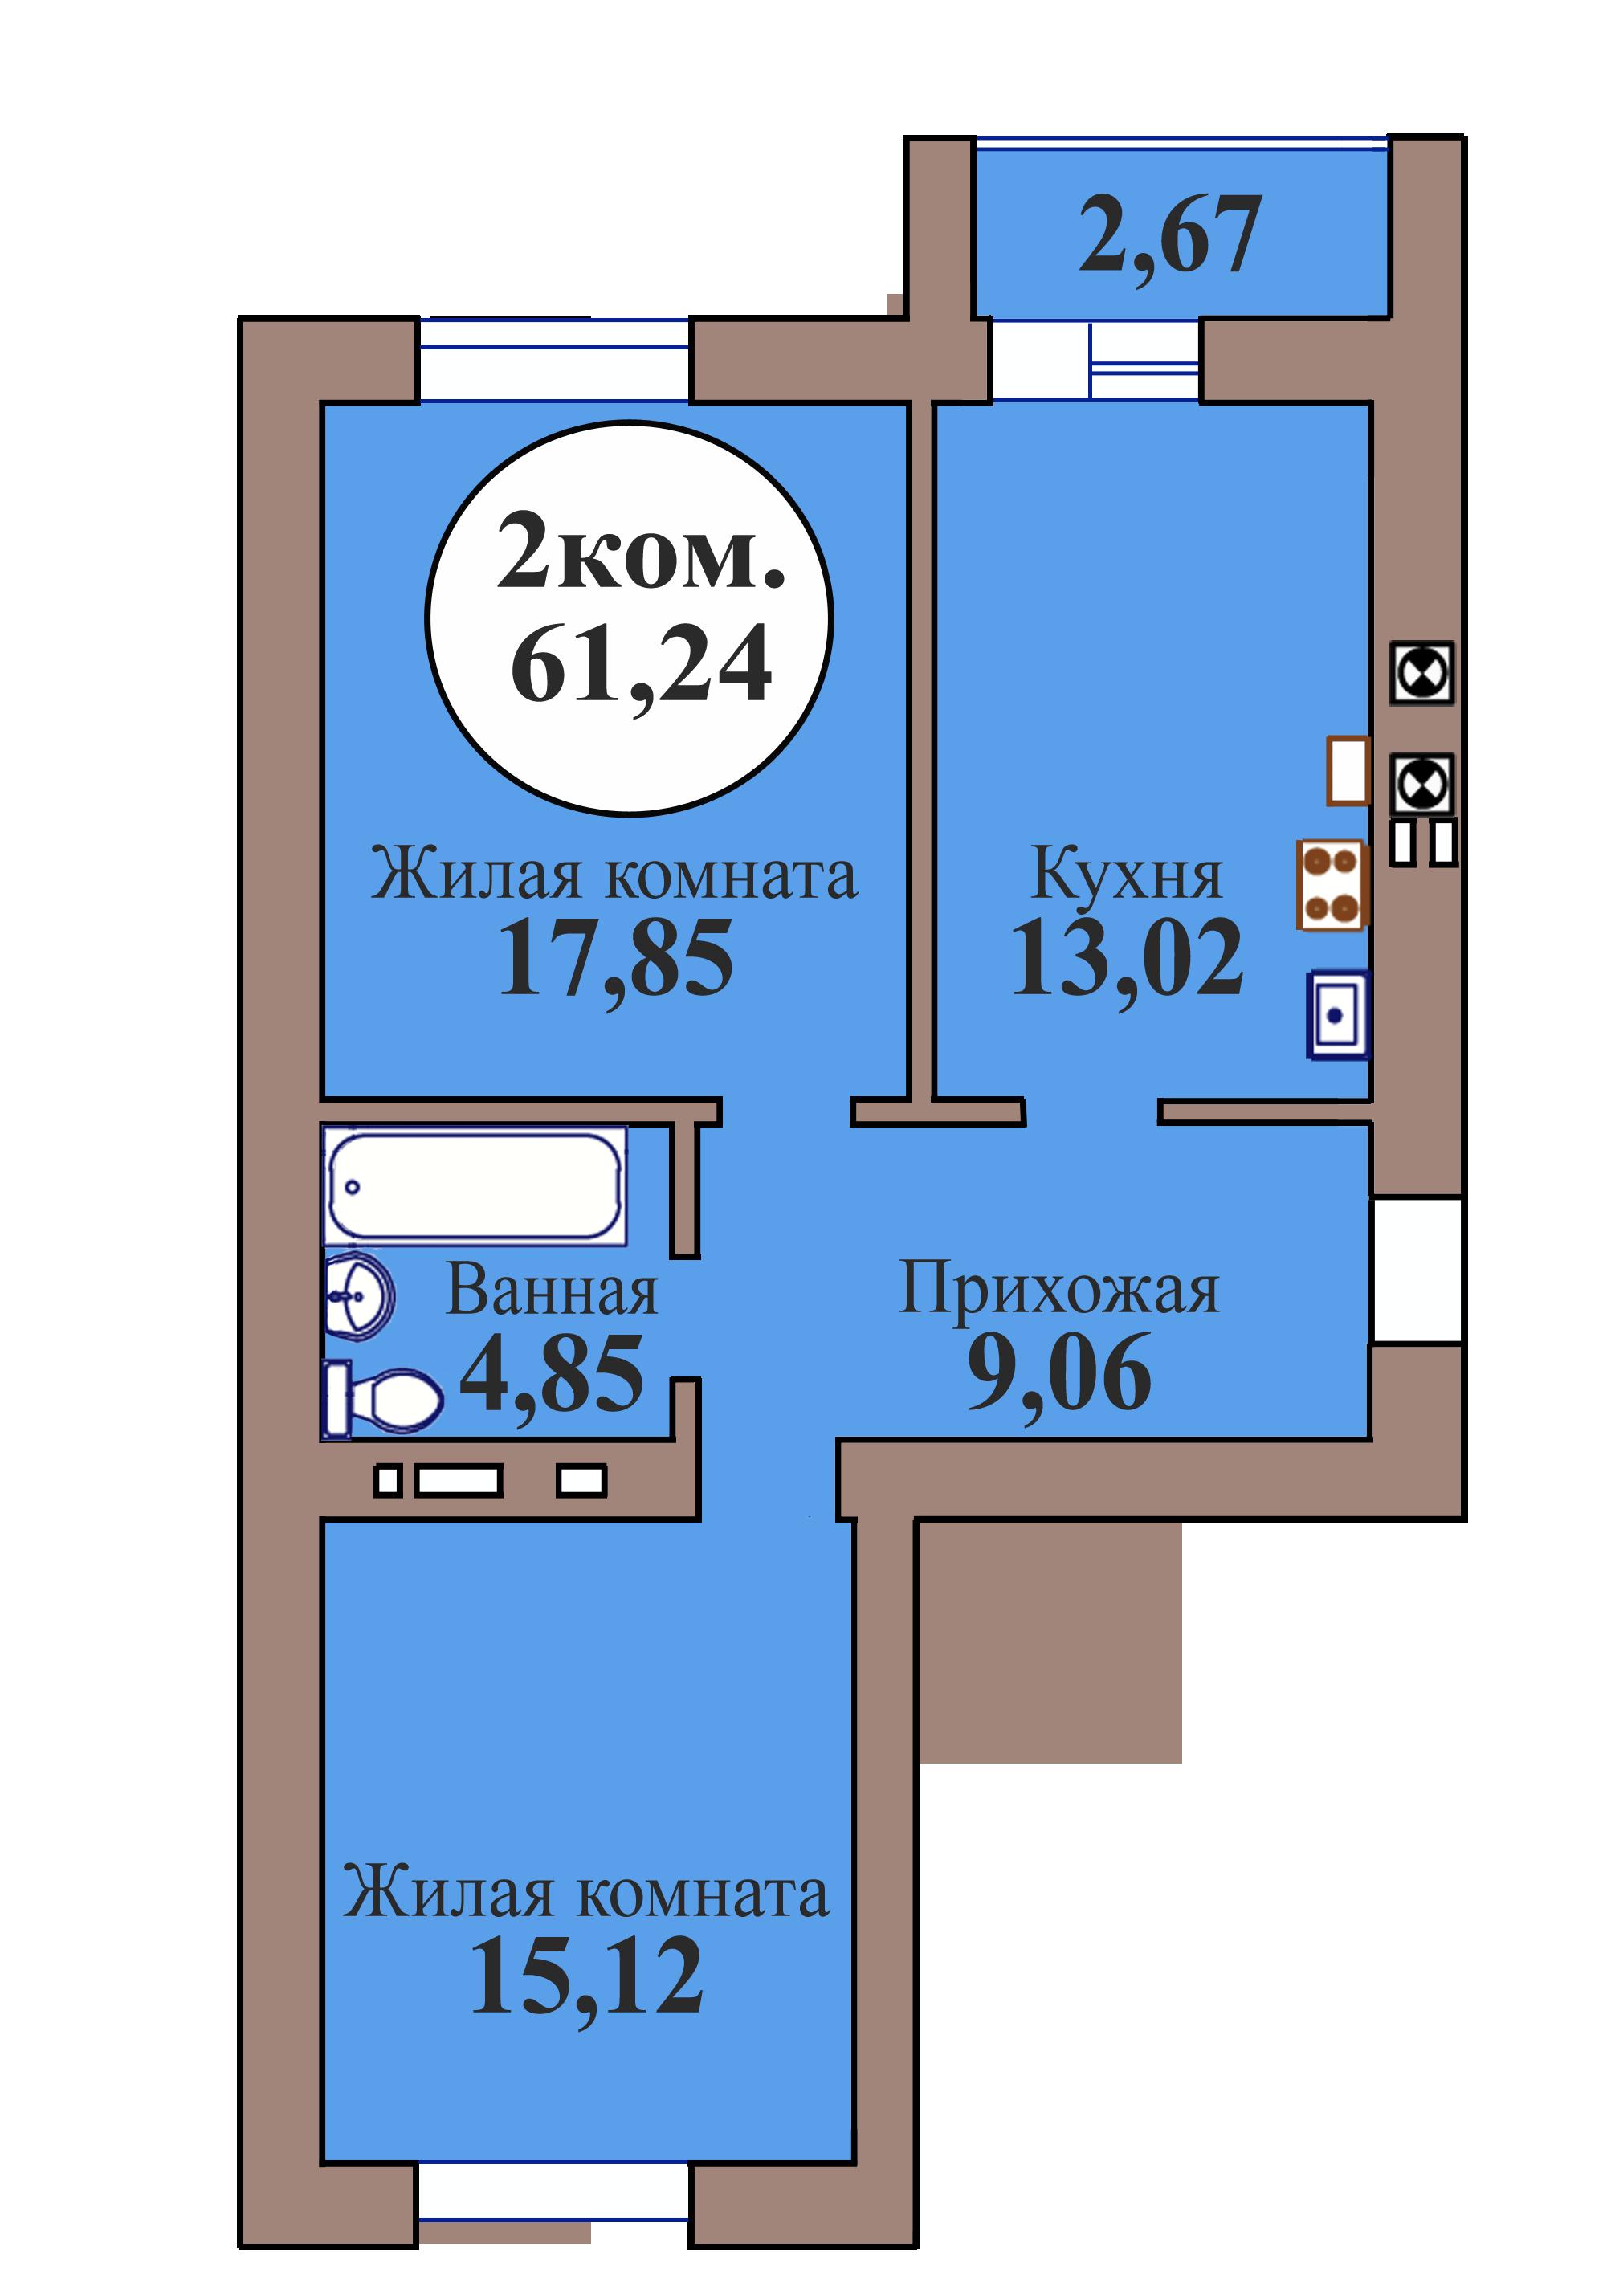 2-комн. кв. по пер. Калининградский, 5 кв. 157 в Калининграде